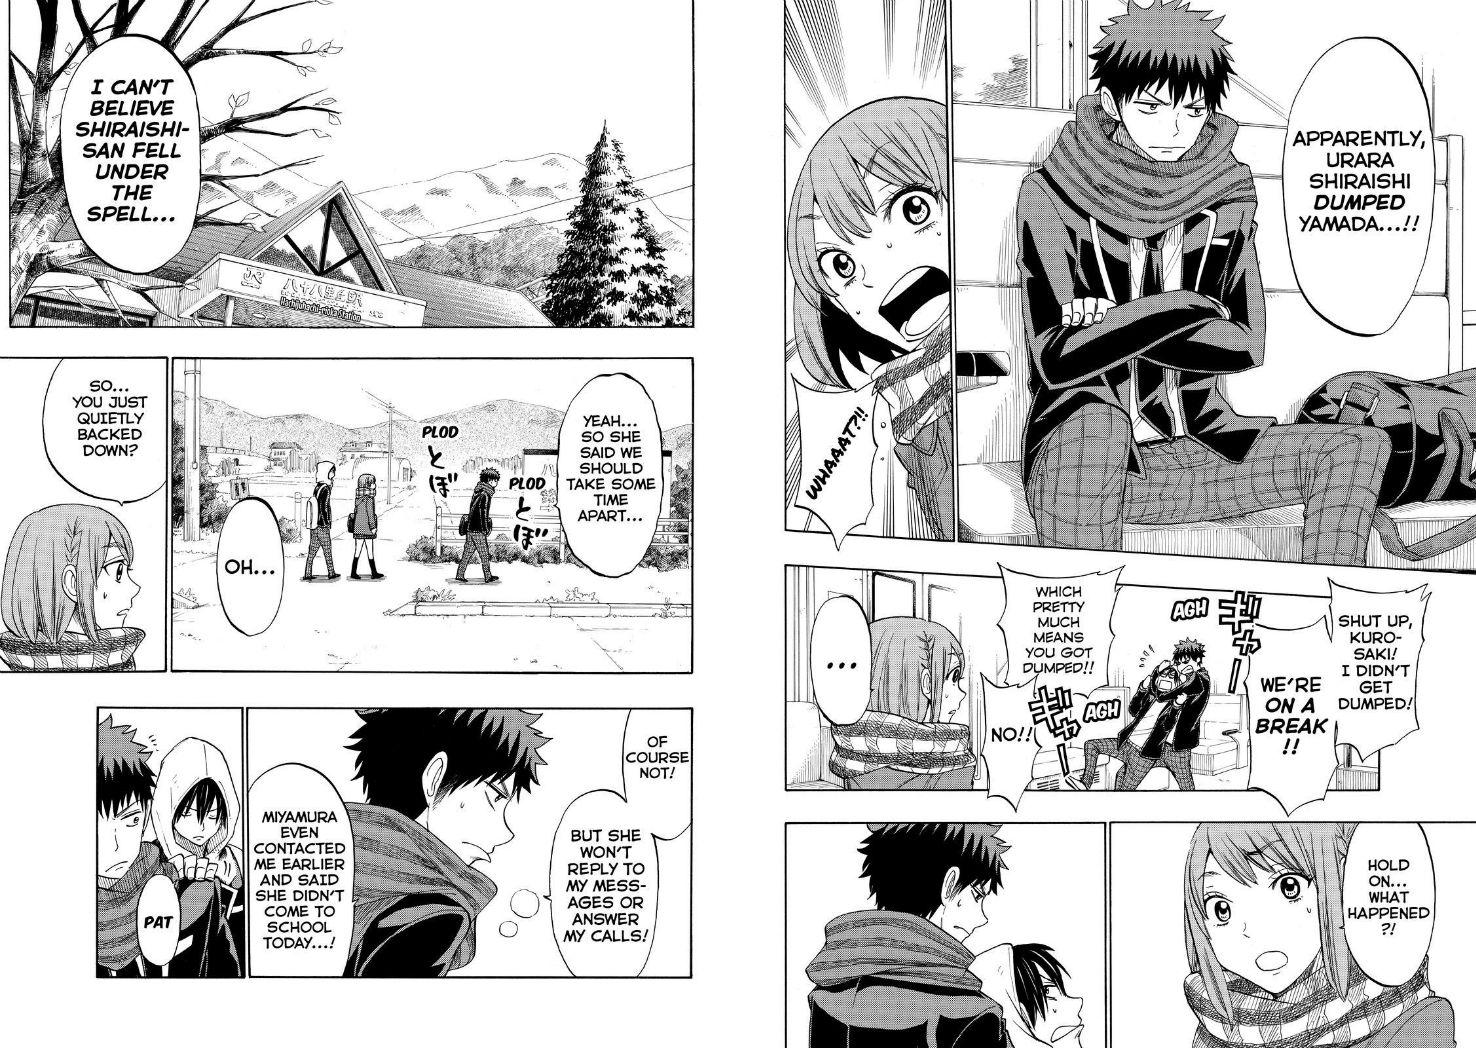 Yamada-kun to 7-nin no Majo 131 Page 2